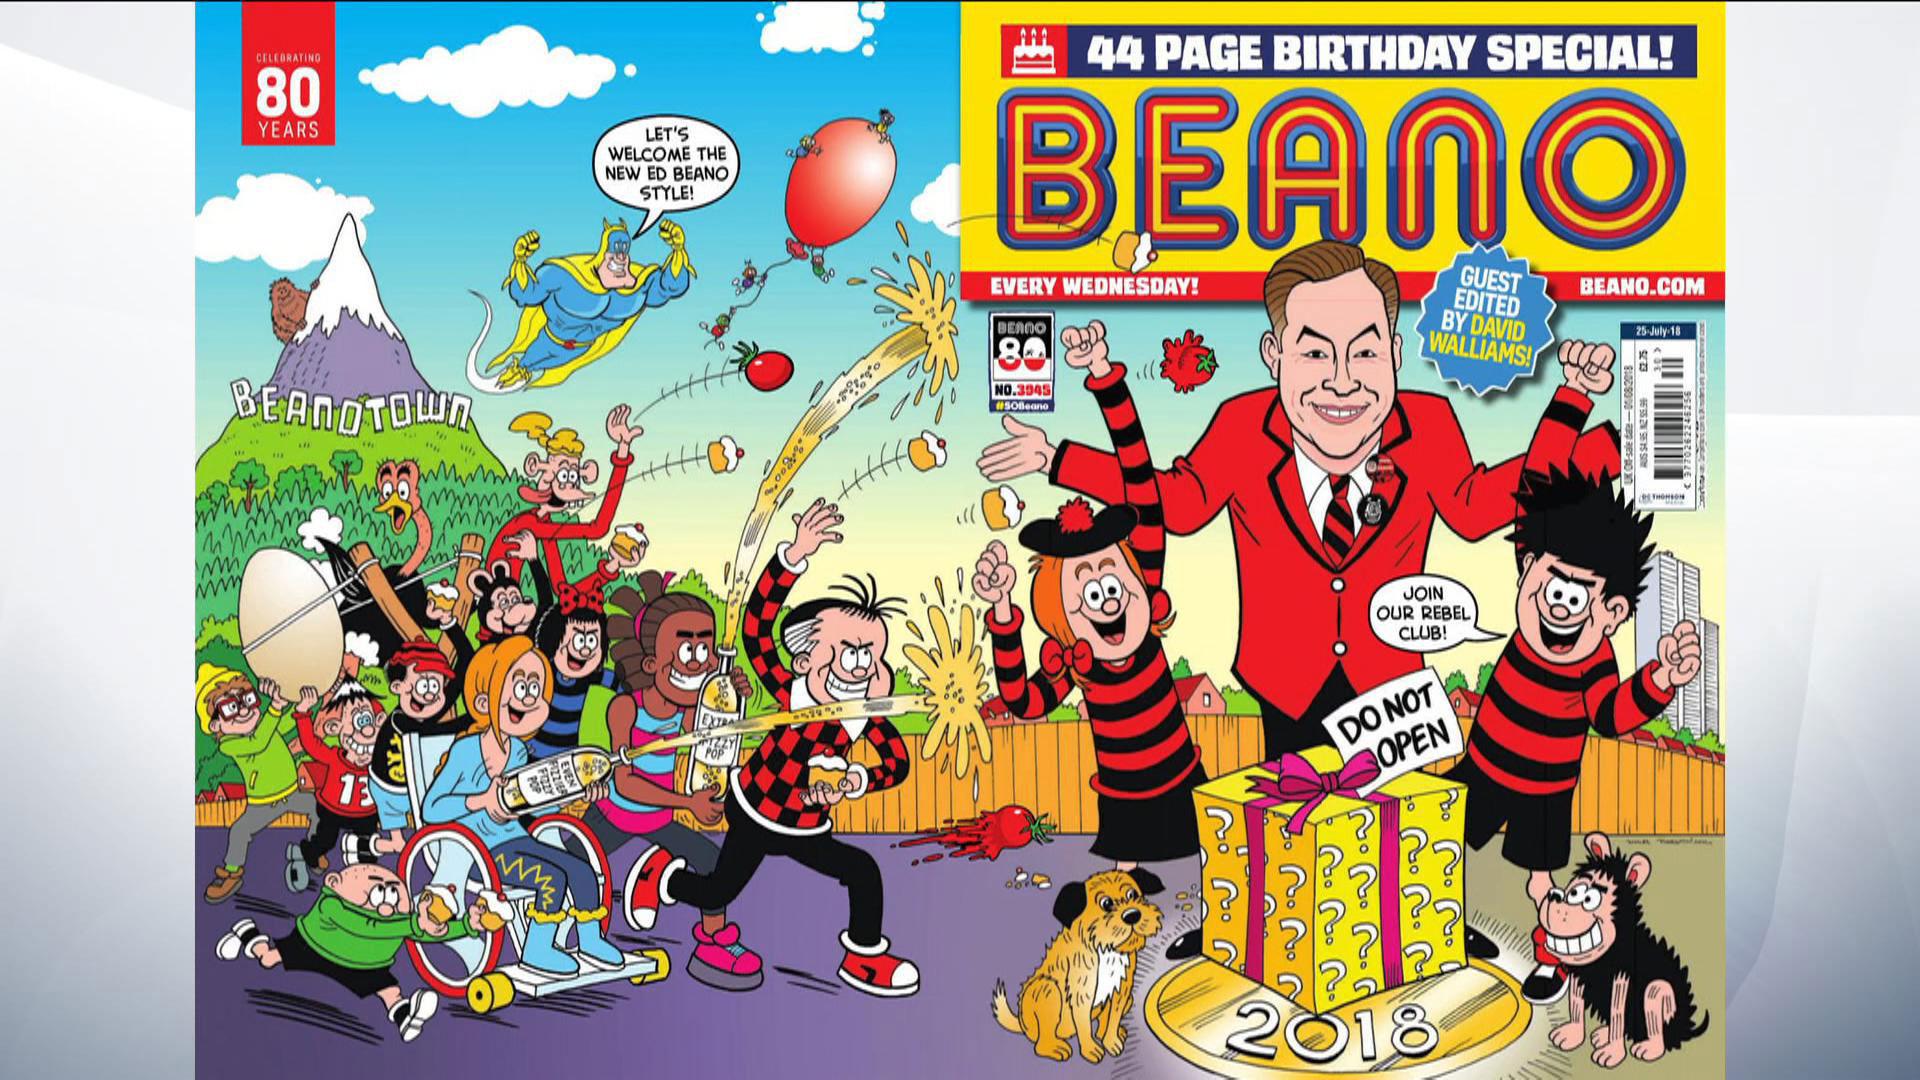 Beano Comic Turns 80 Years Old 300718 Skycom 1920x1080